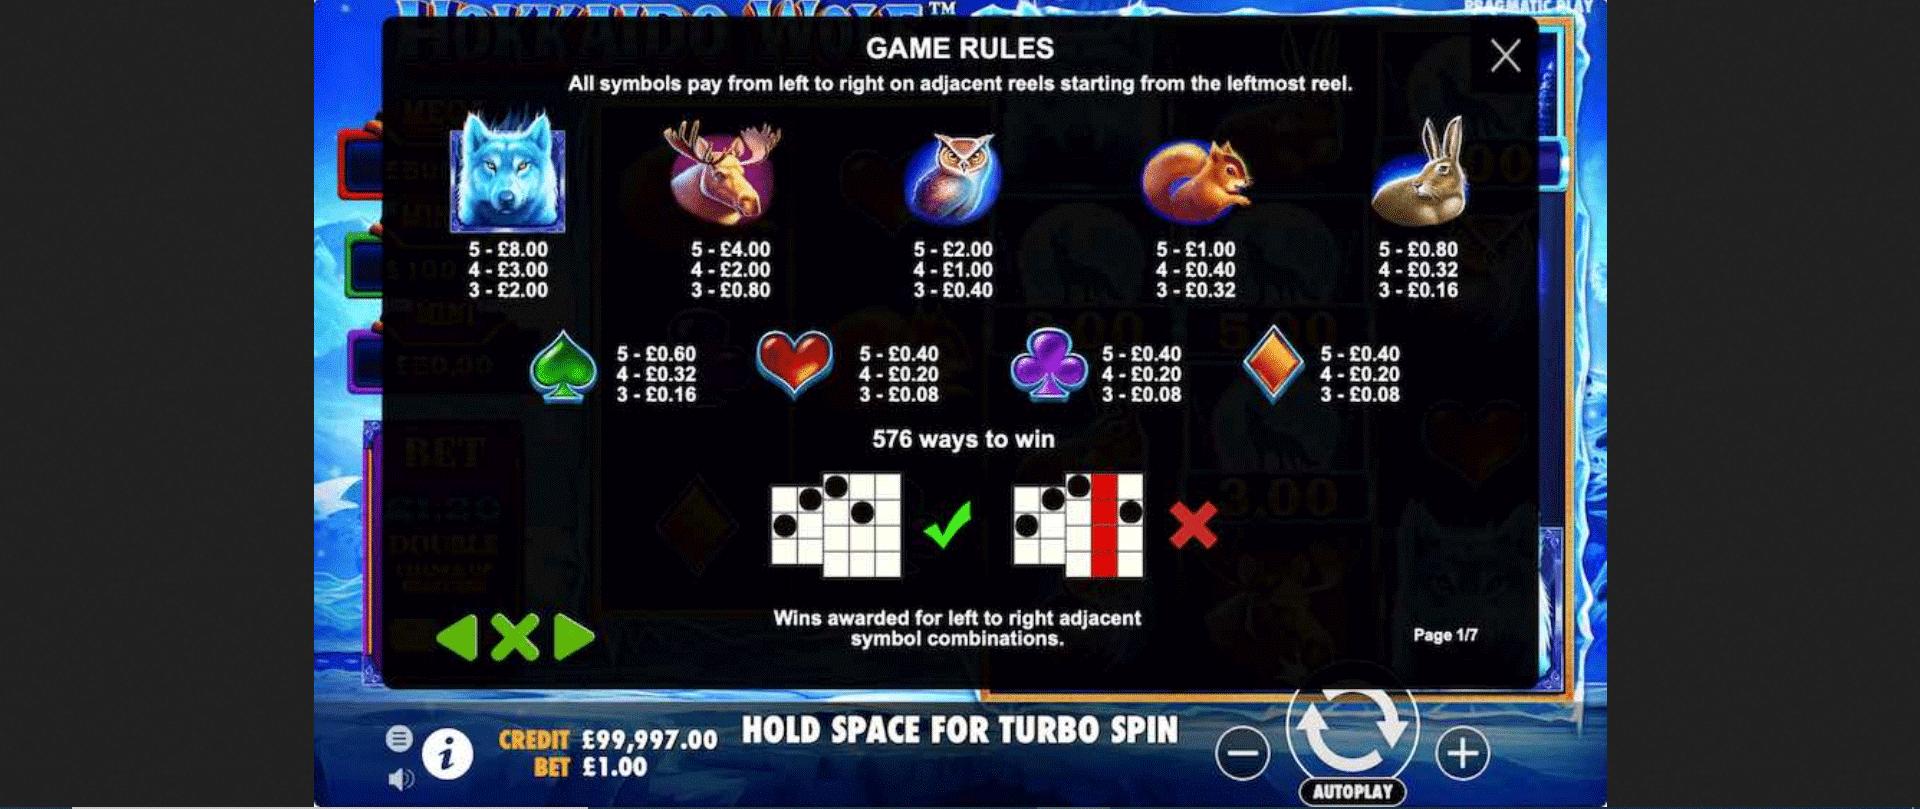 tabella dei simboli della slot online hokkaido wolf